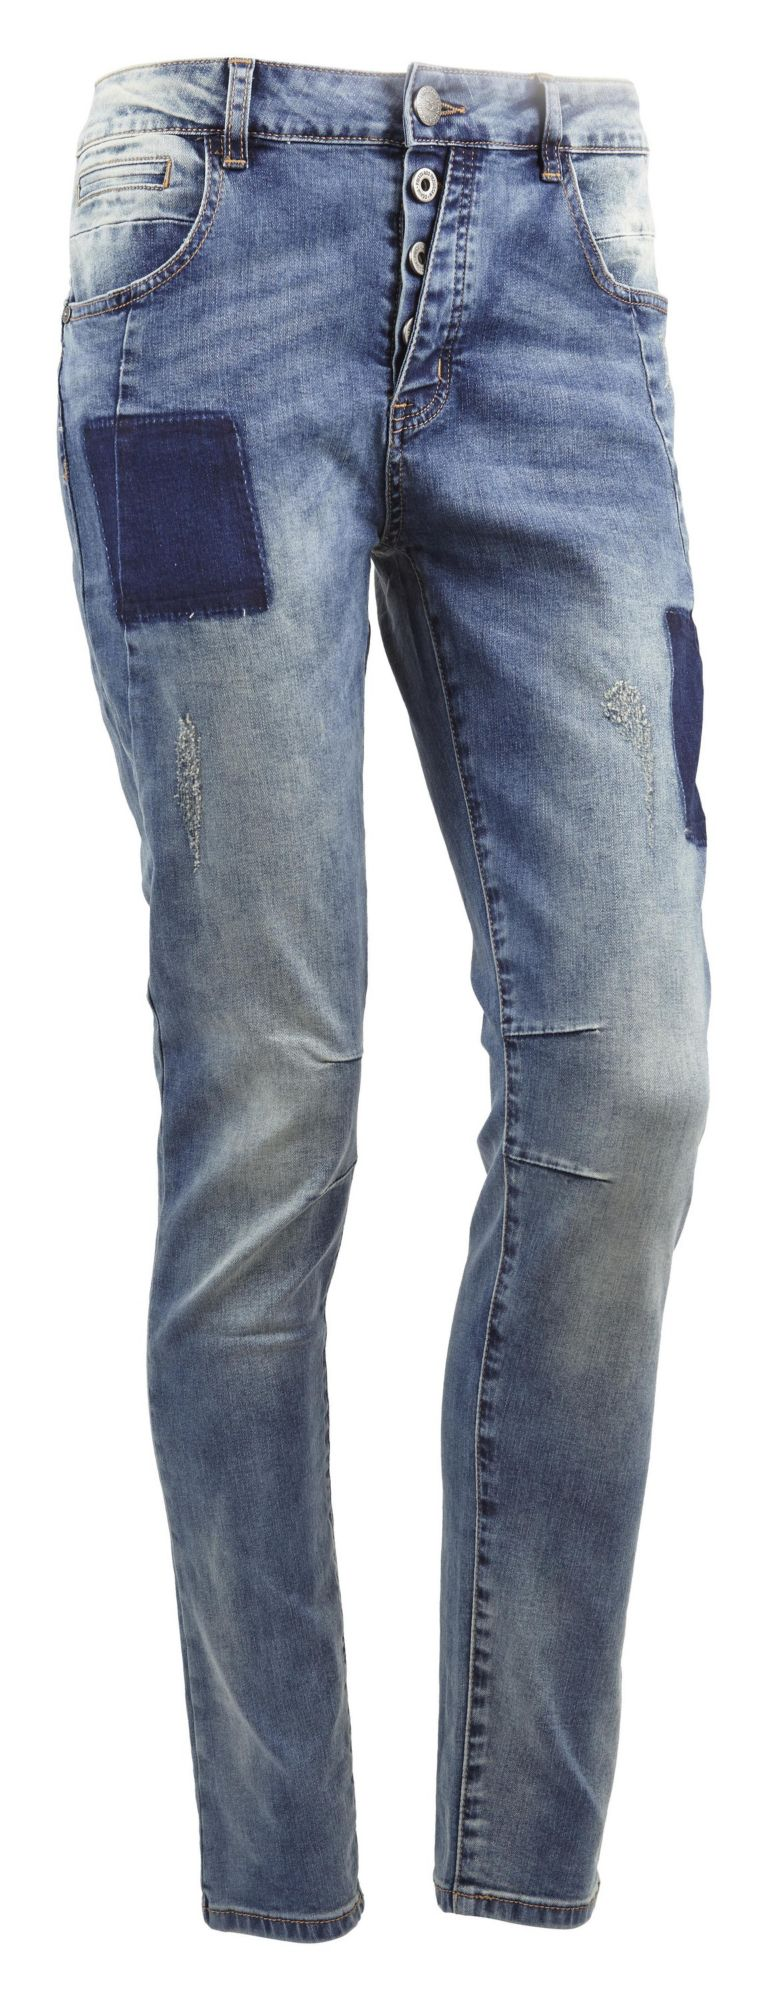 FRITZI AUS PREUSSEN Fritzi aus Preußen Jeans »Ohio«